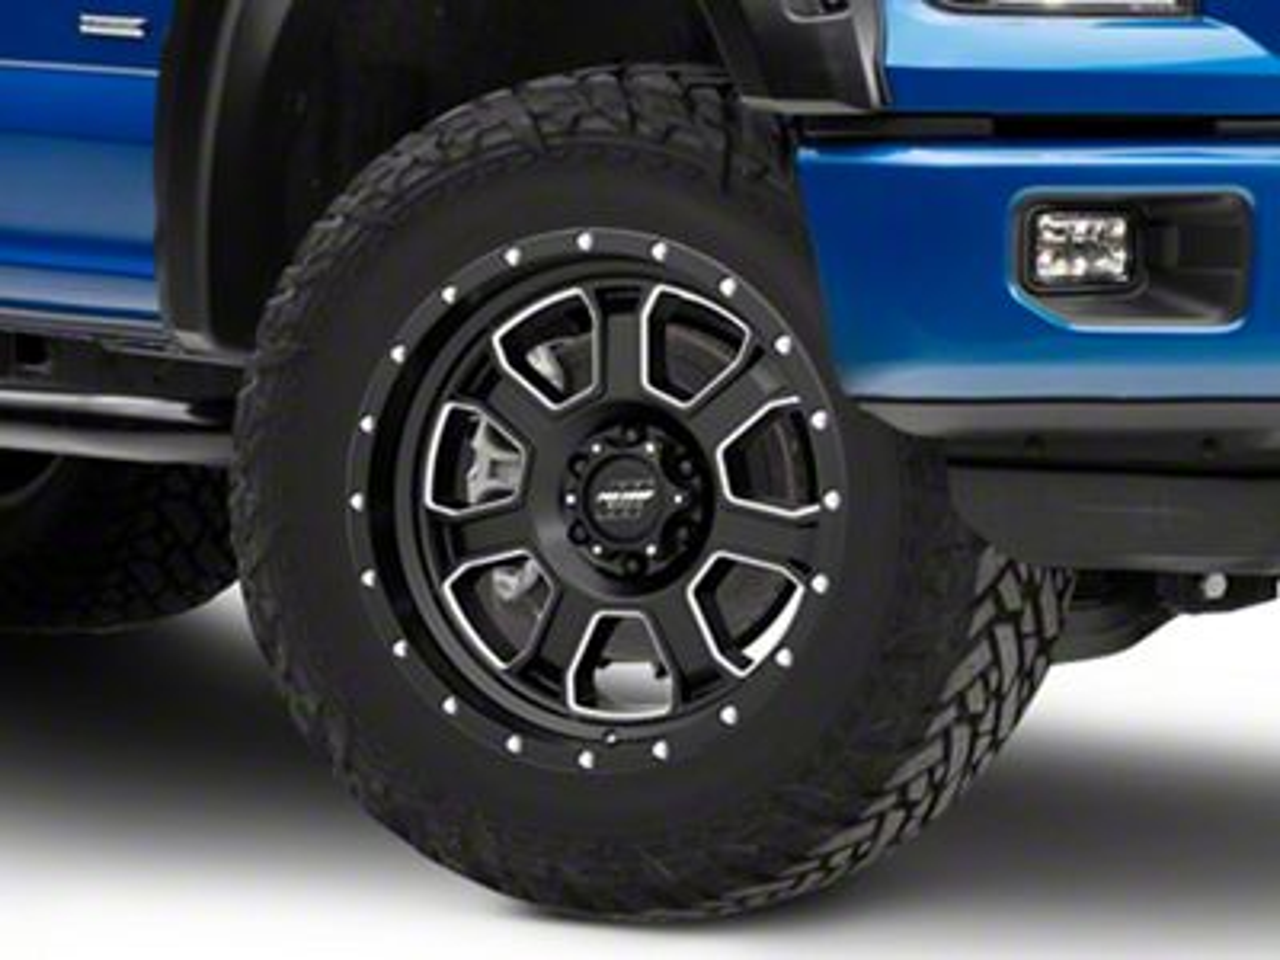 Pro Comp Sledge Satin Black Milled 6-Lug Wheel - 20x9 (04-18 F-150)